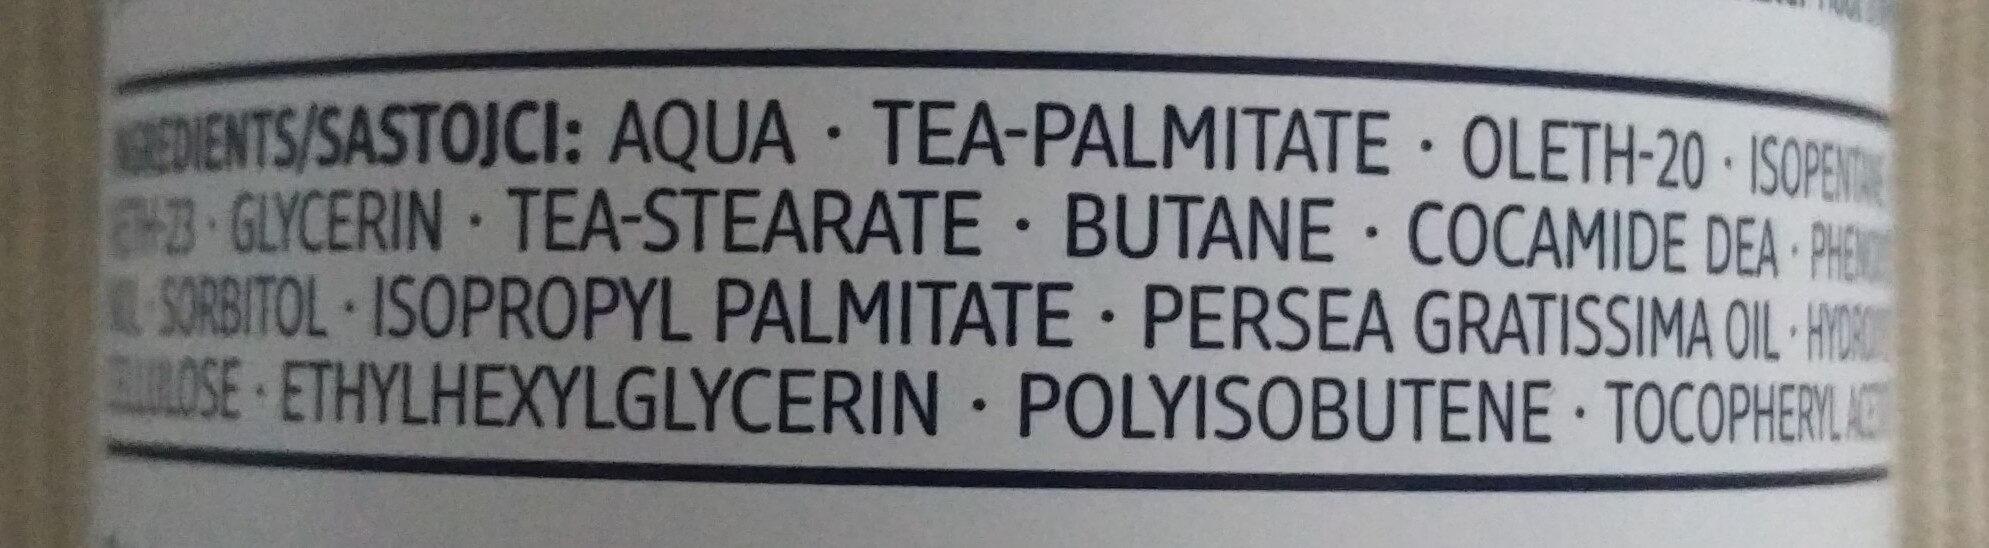 Ultra Sensitive Rasiergel - Ingrédients - de